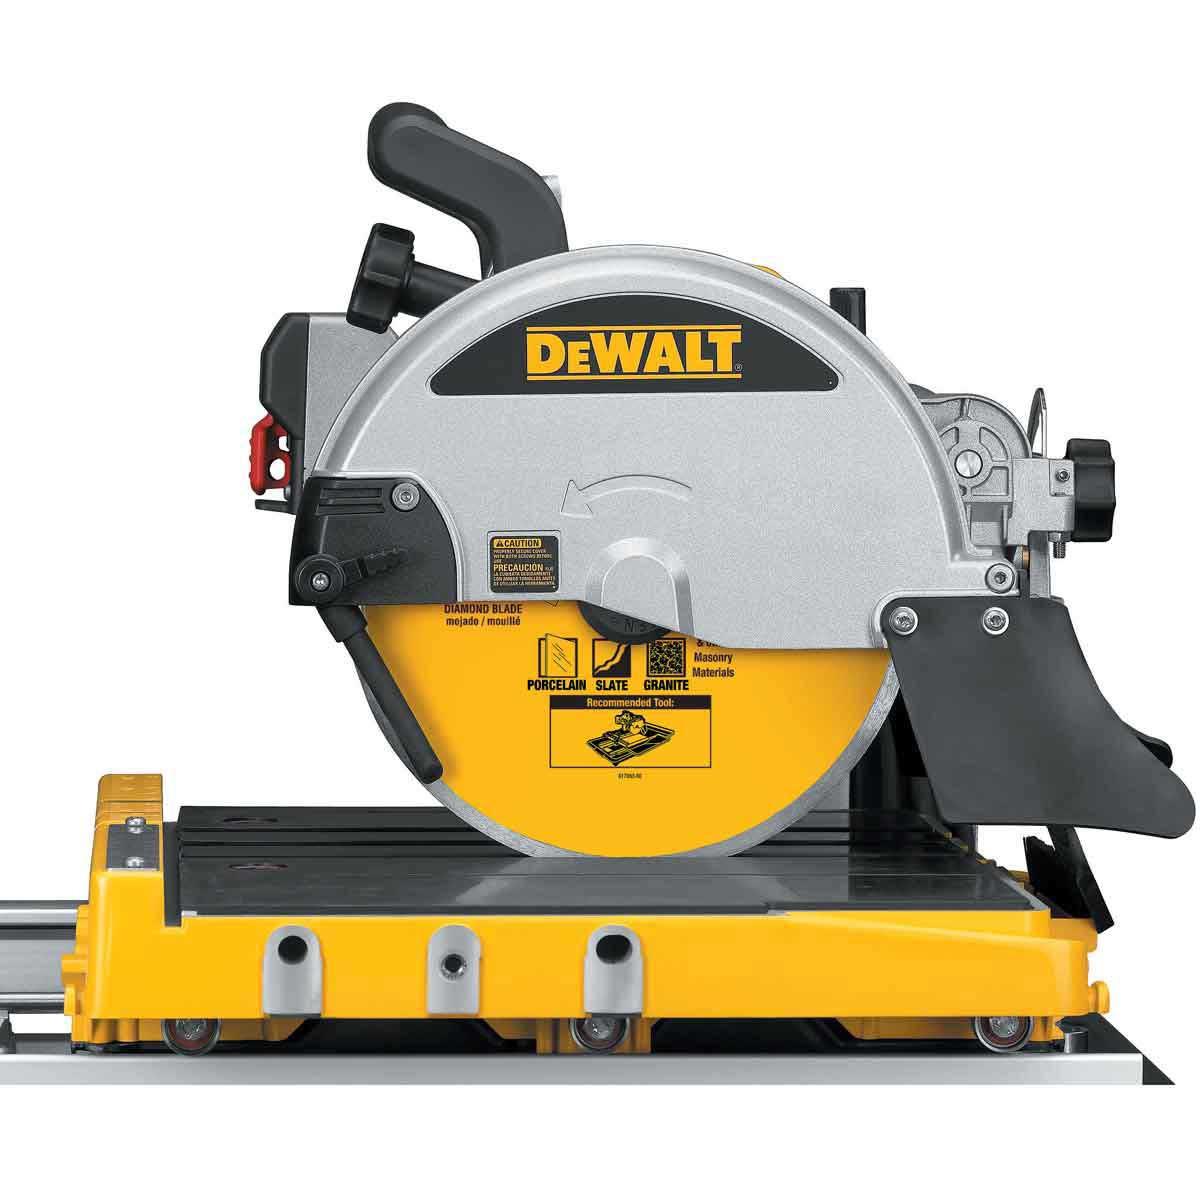 D24000s dewalt wet tile saw stand contractors direct dewalt d24000 10 inch tile saw greentooth Image collections